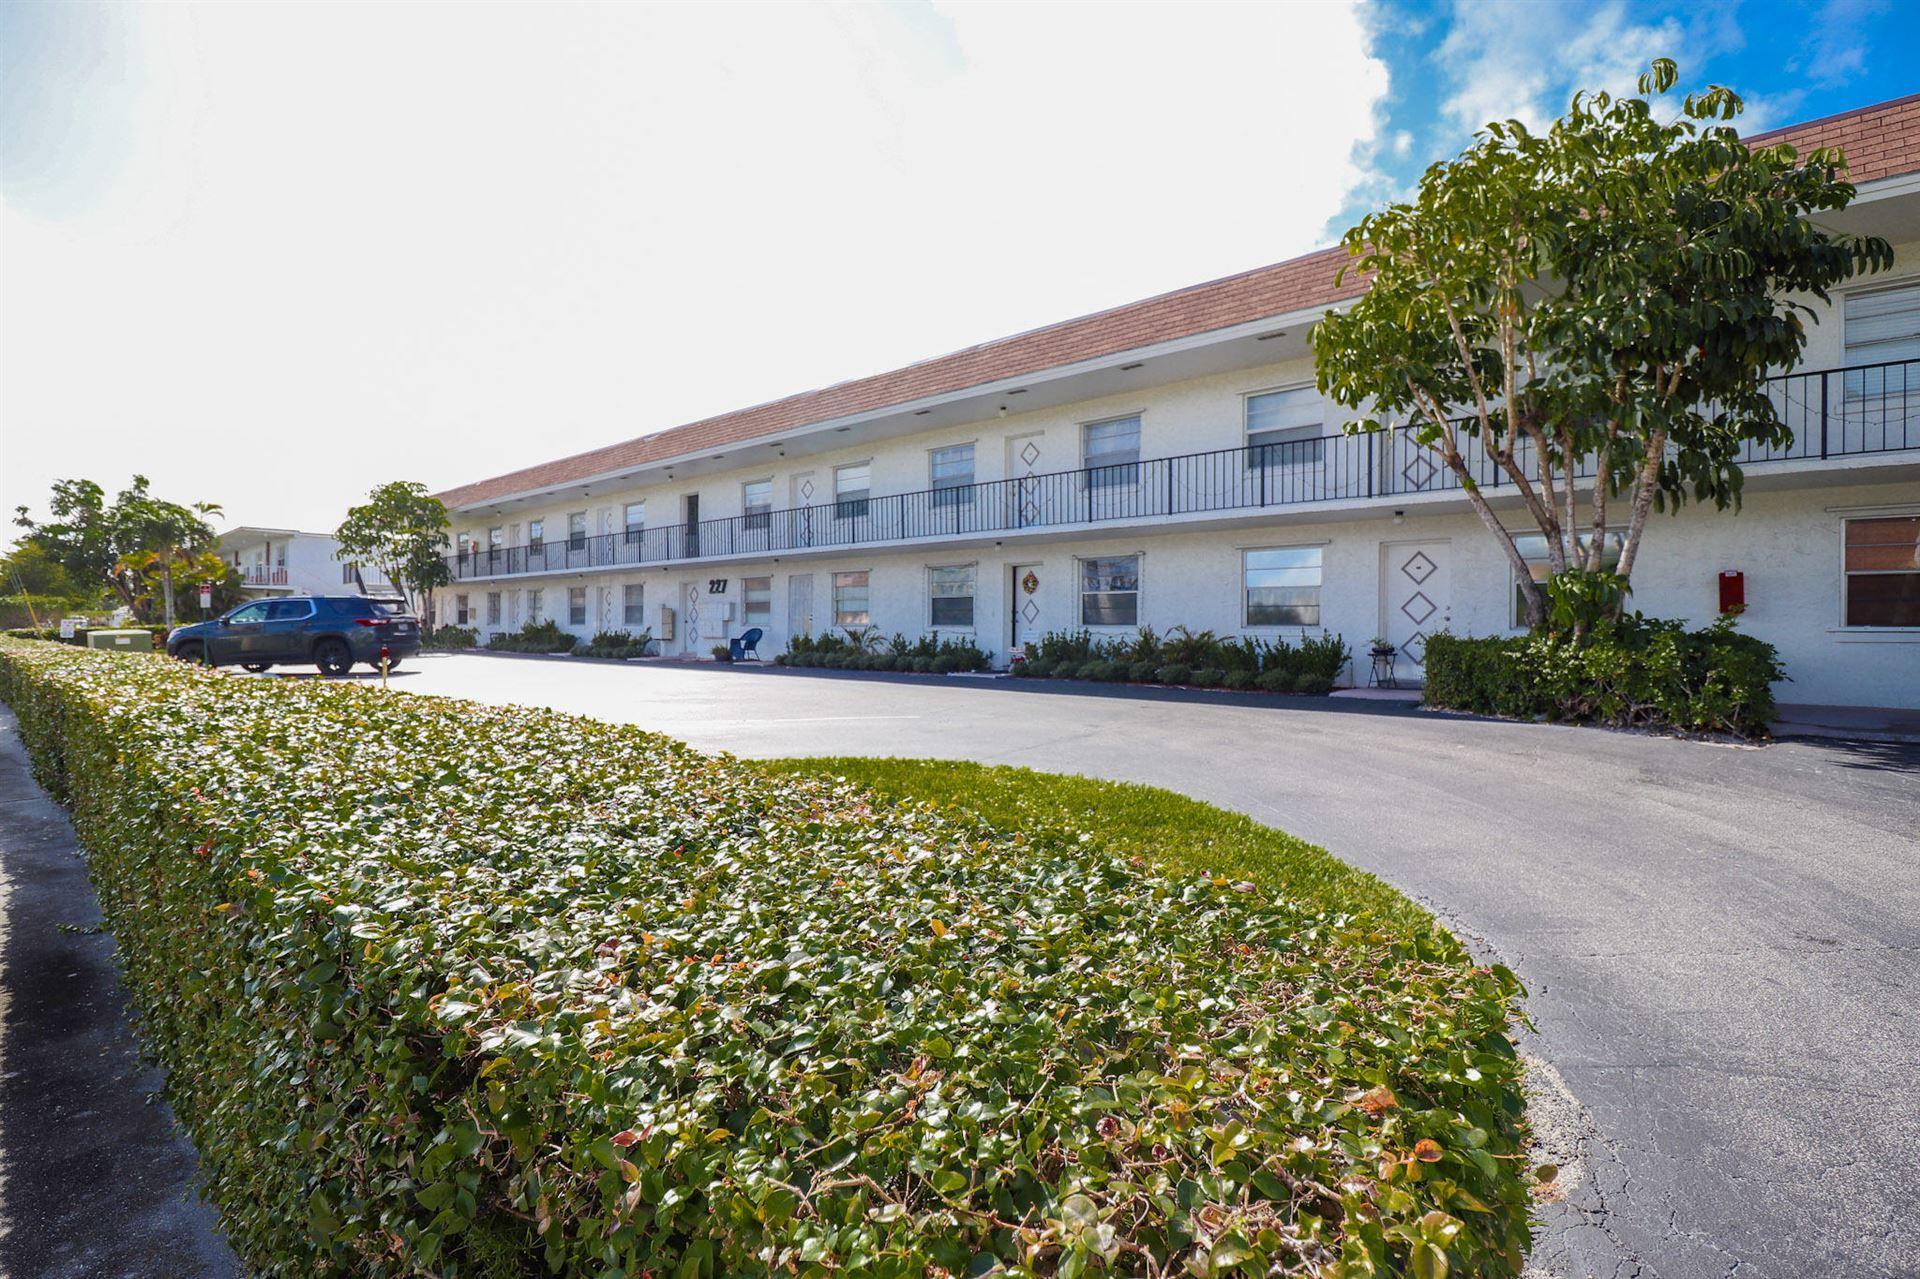 227 Castlewood Drive #203, North Palm Beach, FL 33408 - #: RX-10683867